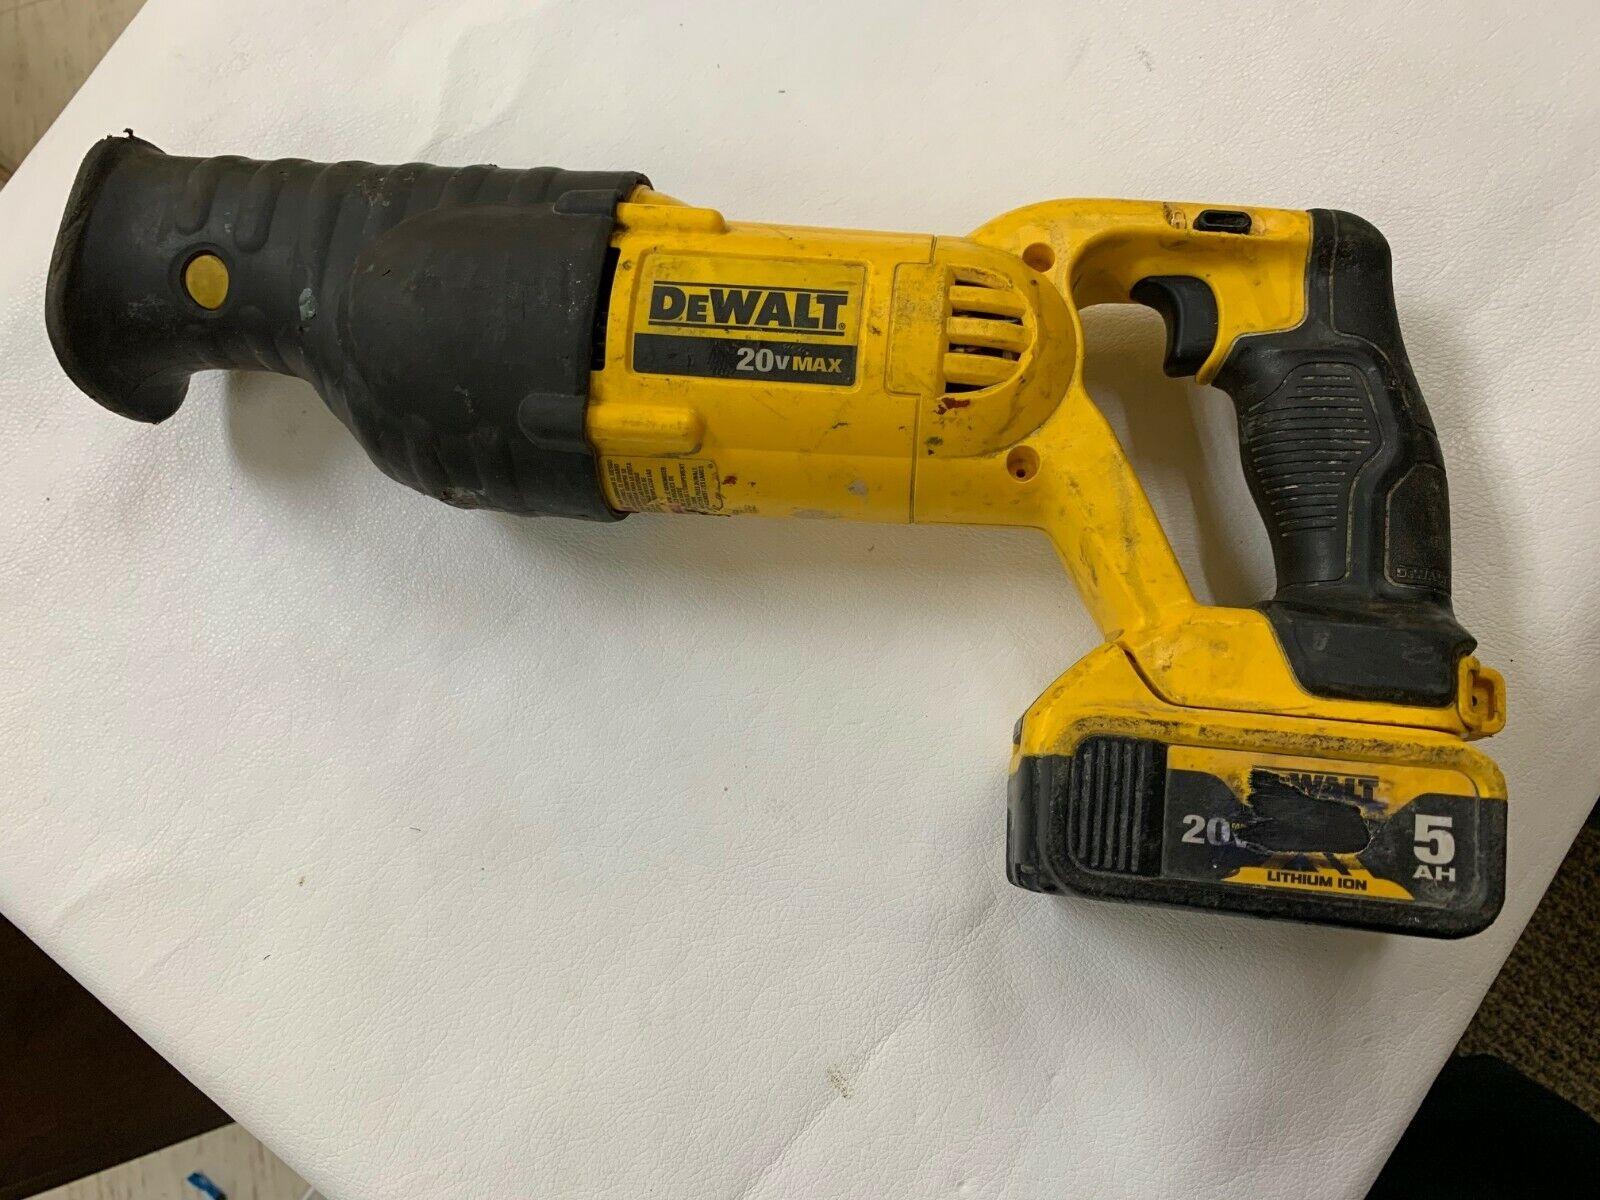 Bare Tool DEWALT 20V MAX Li-Ion Reciprocating Saw DCS380B Recon